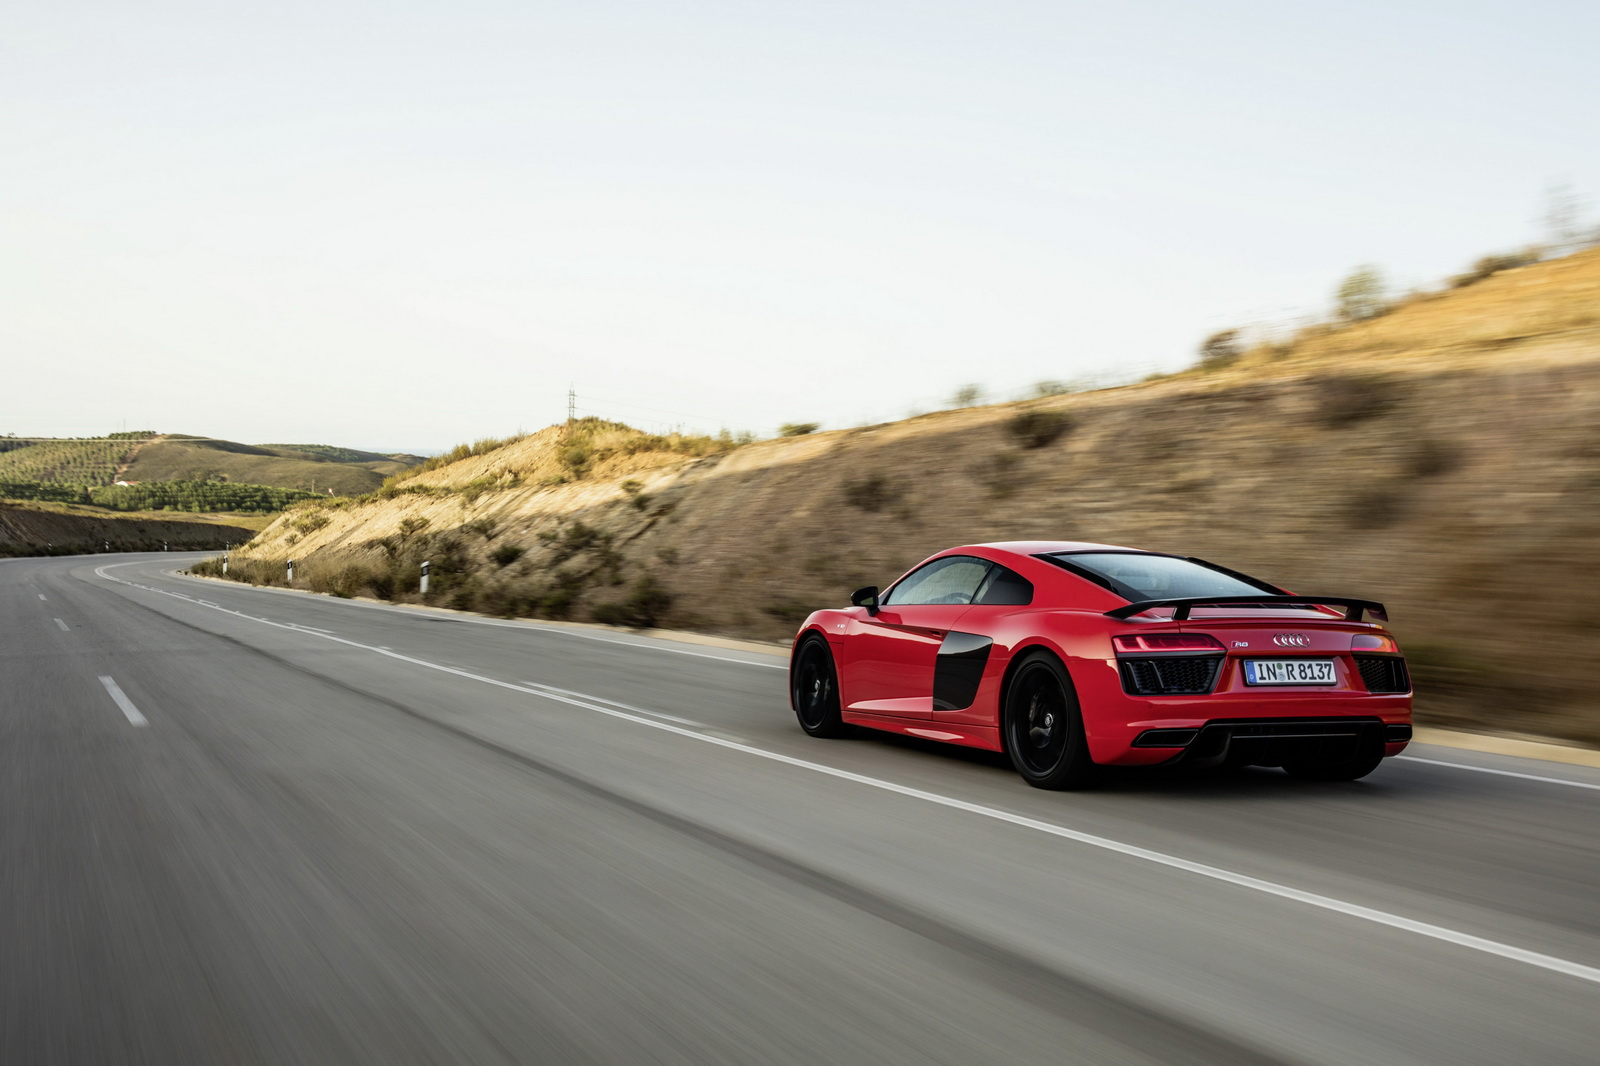 2015 Audi R8 V10 Plus on track rear